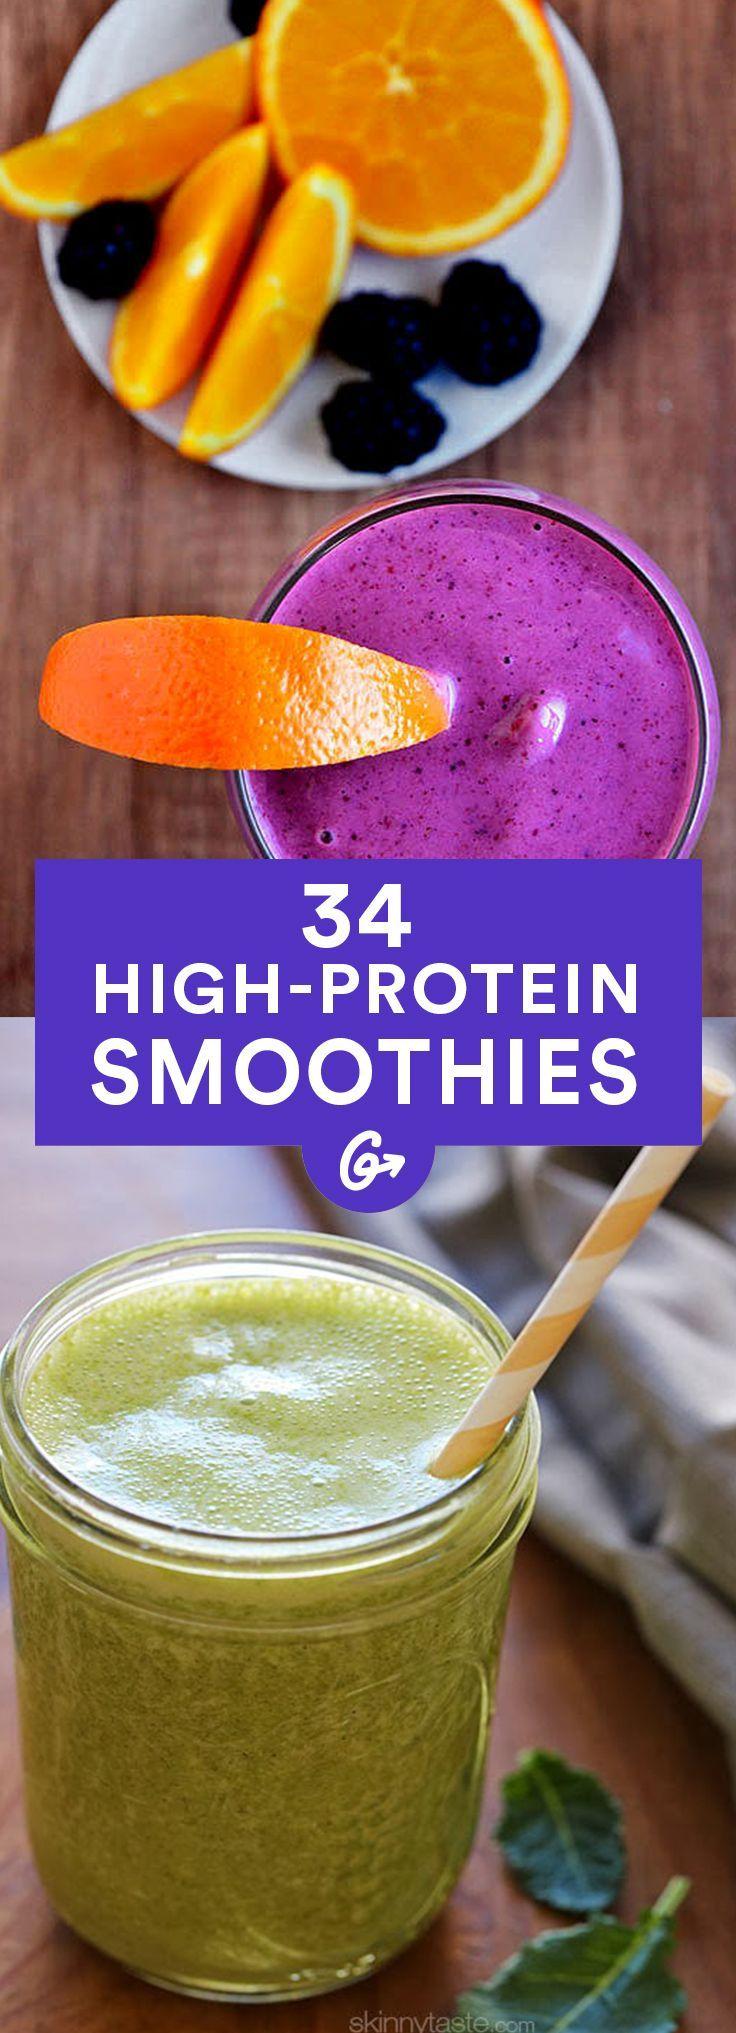 1000+ ideas about Women Protein Shakes on Pinterest | Protein shakes for women, Whey protein and ...